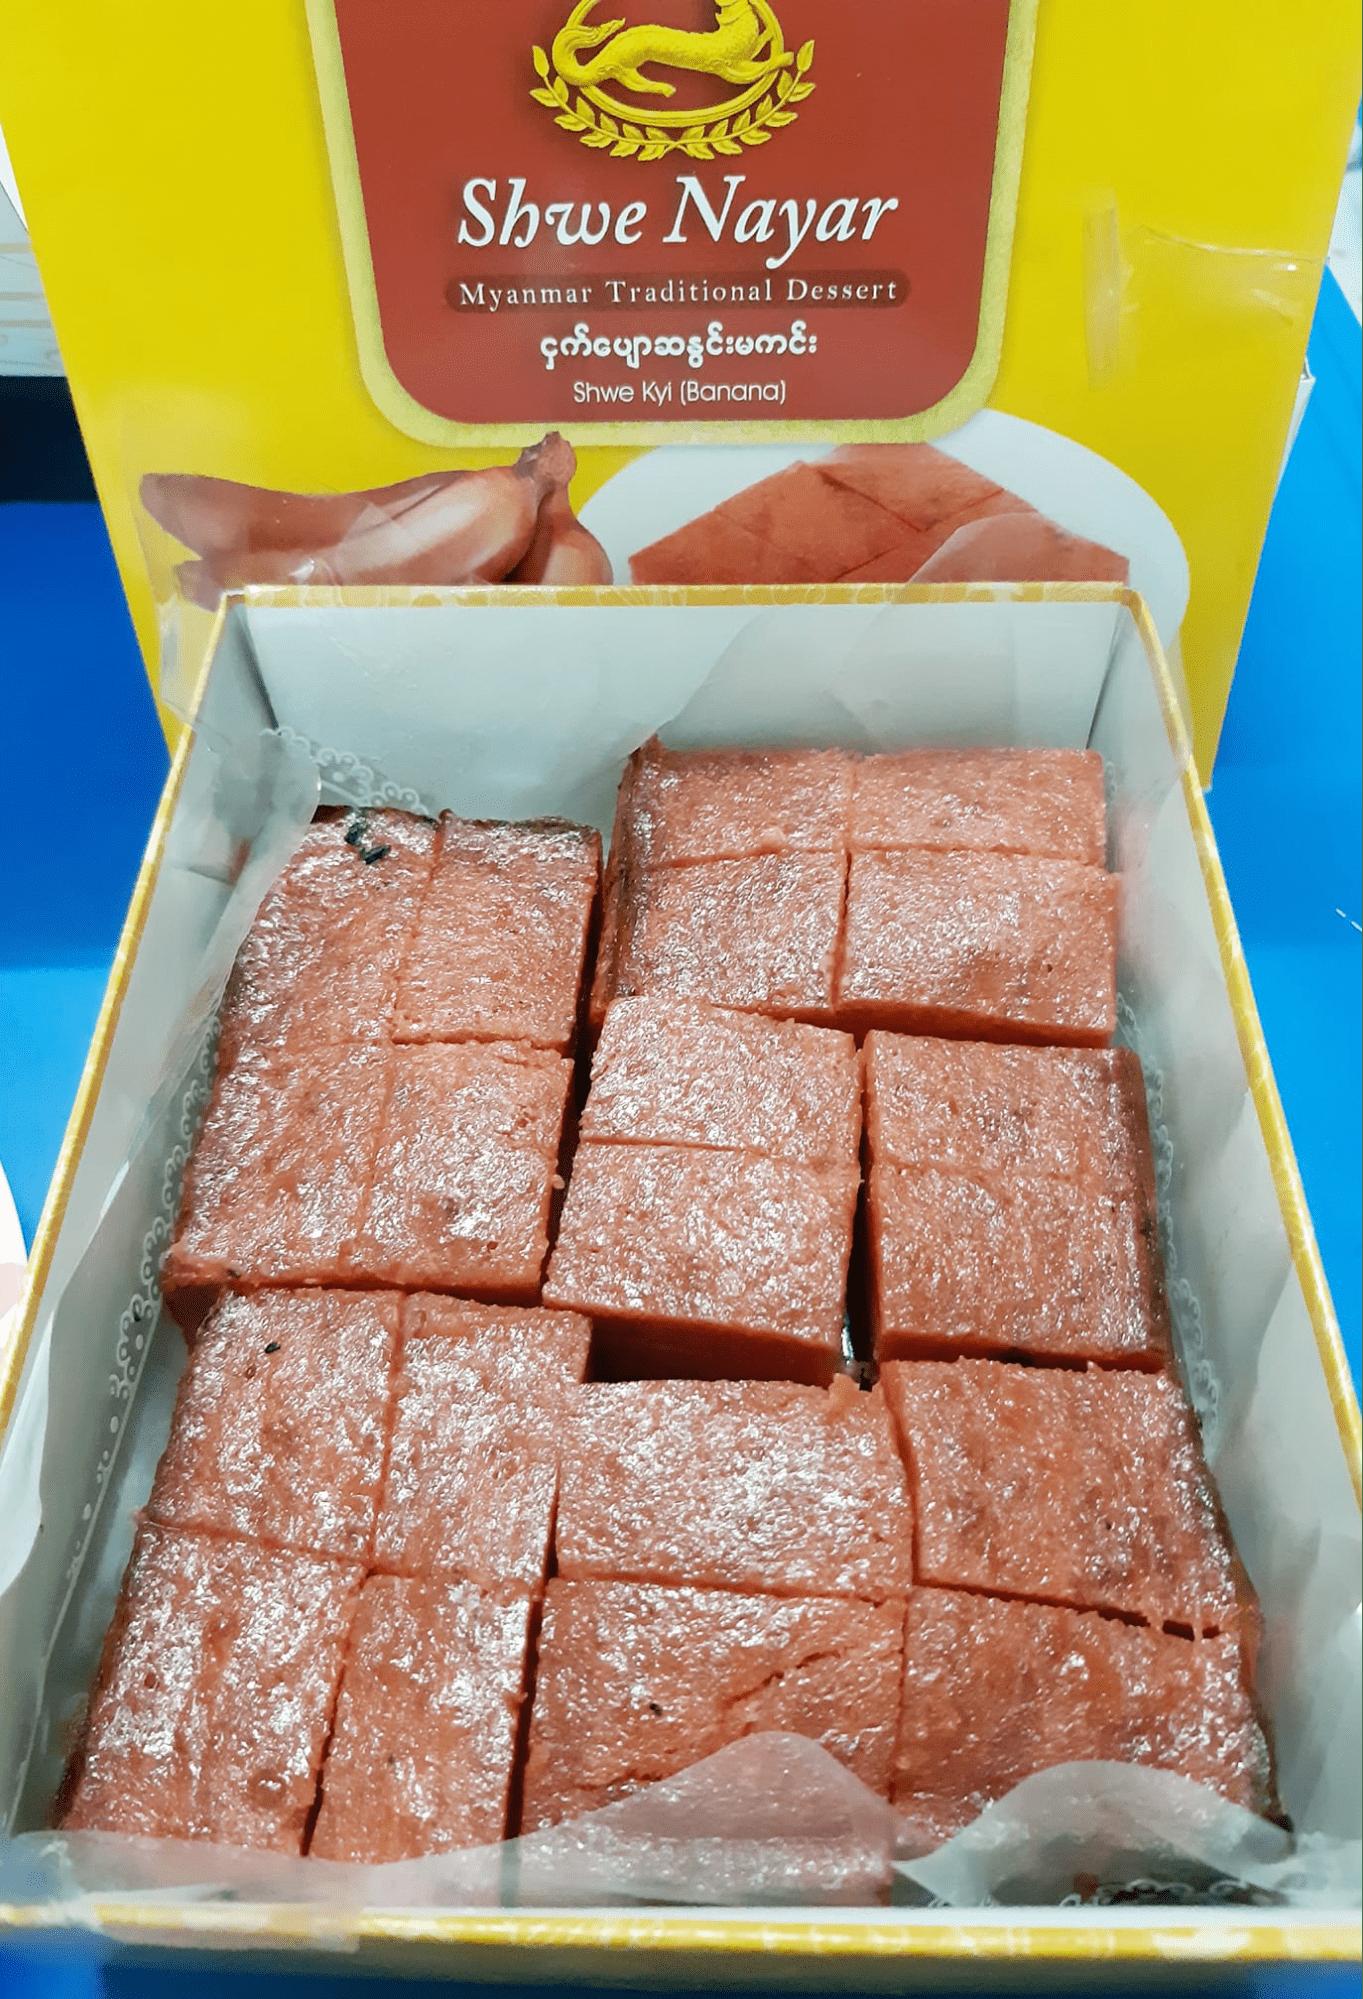 international-snack-shops - myanmar snacks